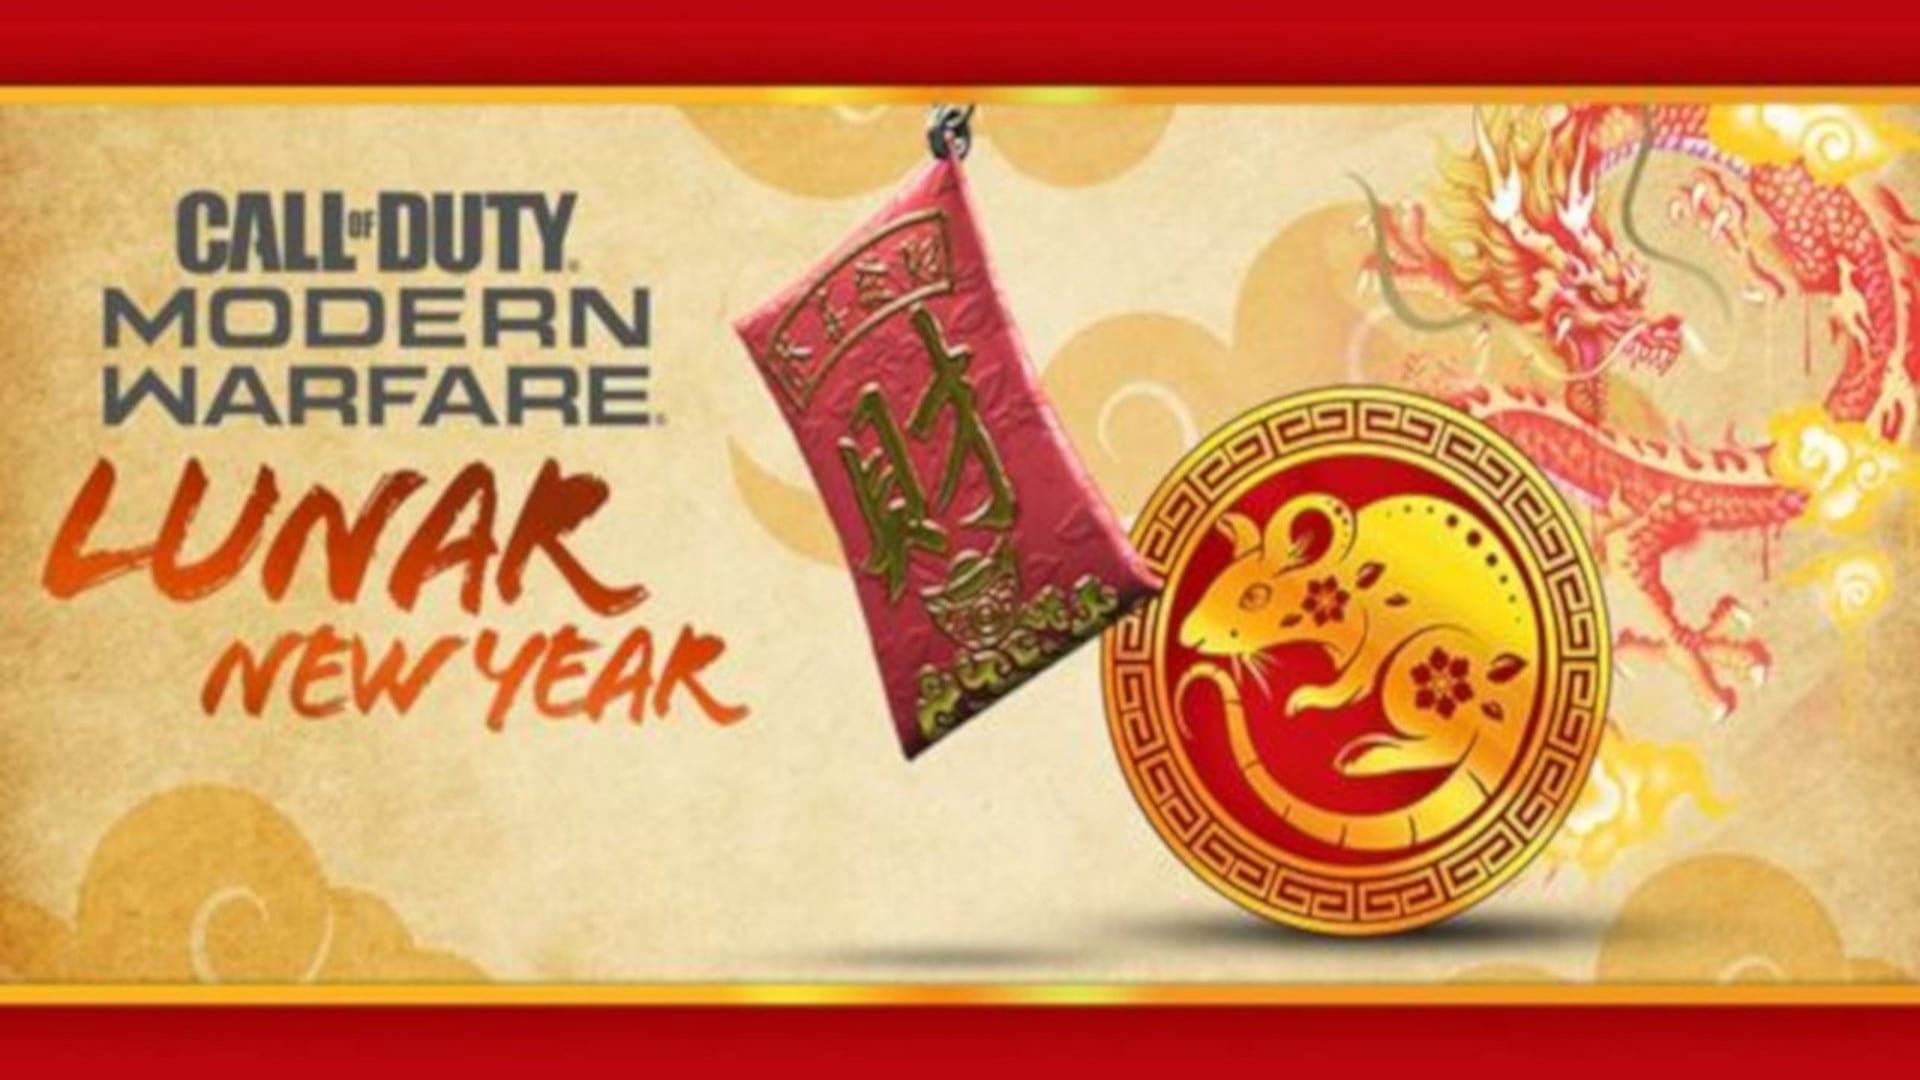 Call of Duty: Modern Warfare Celebrates Lunar New Year 2020 With a New Seasonal Items Bundle Launch